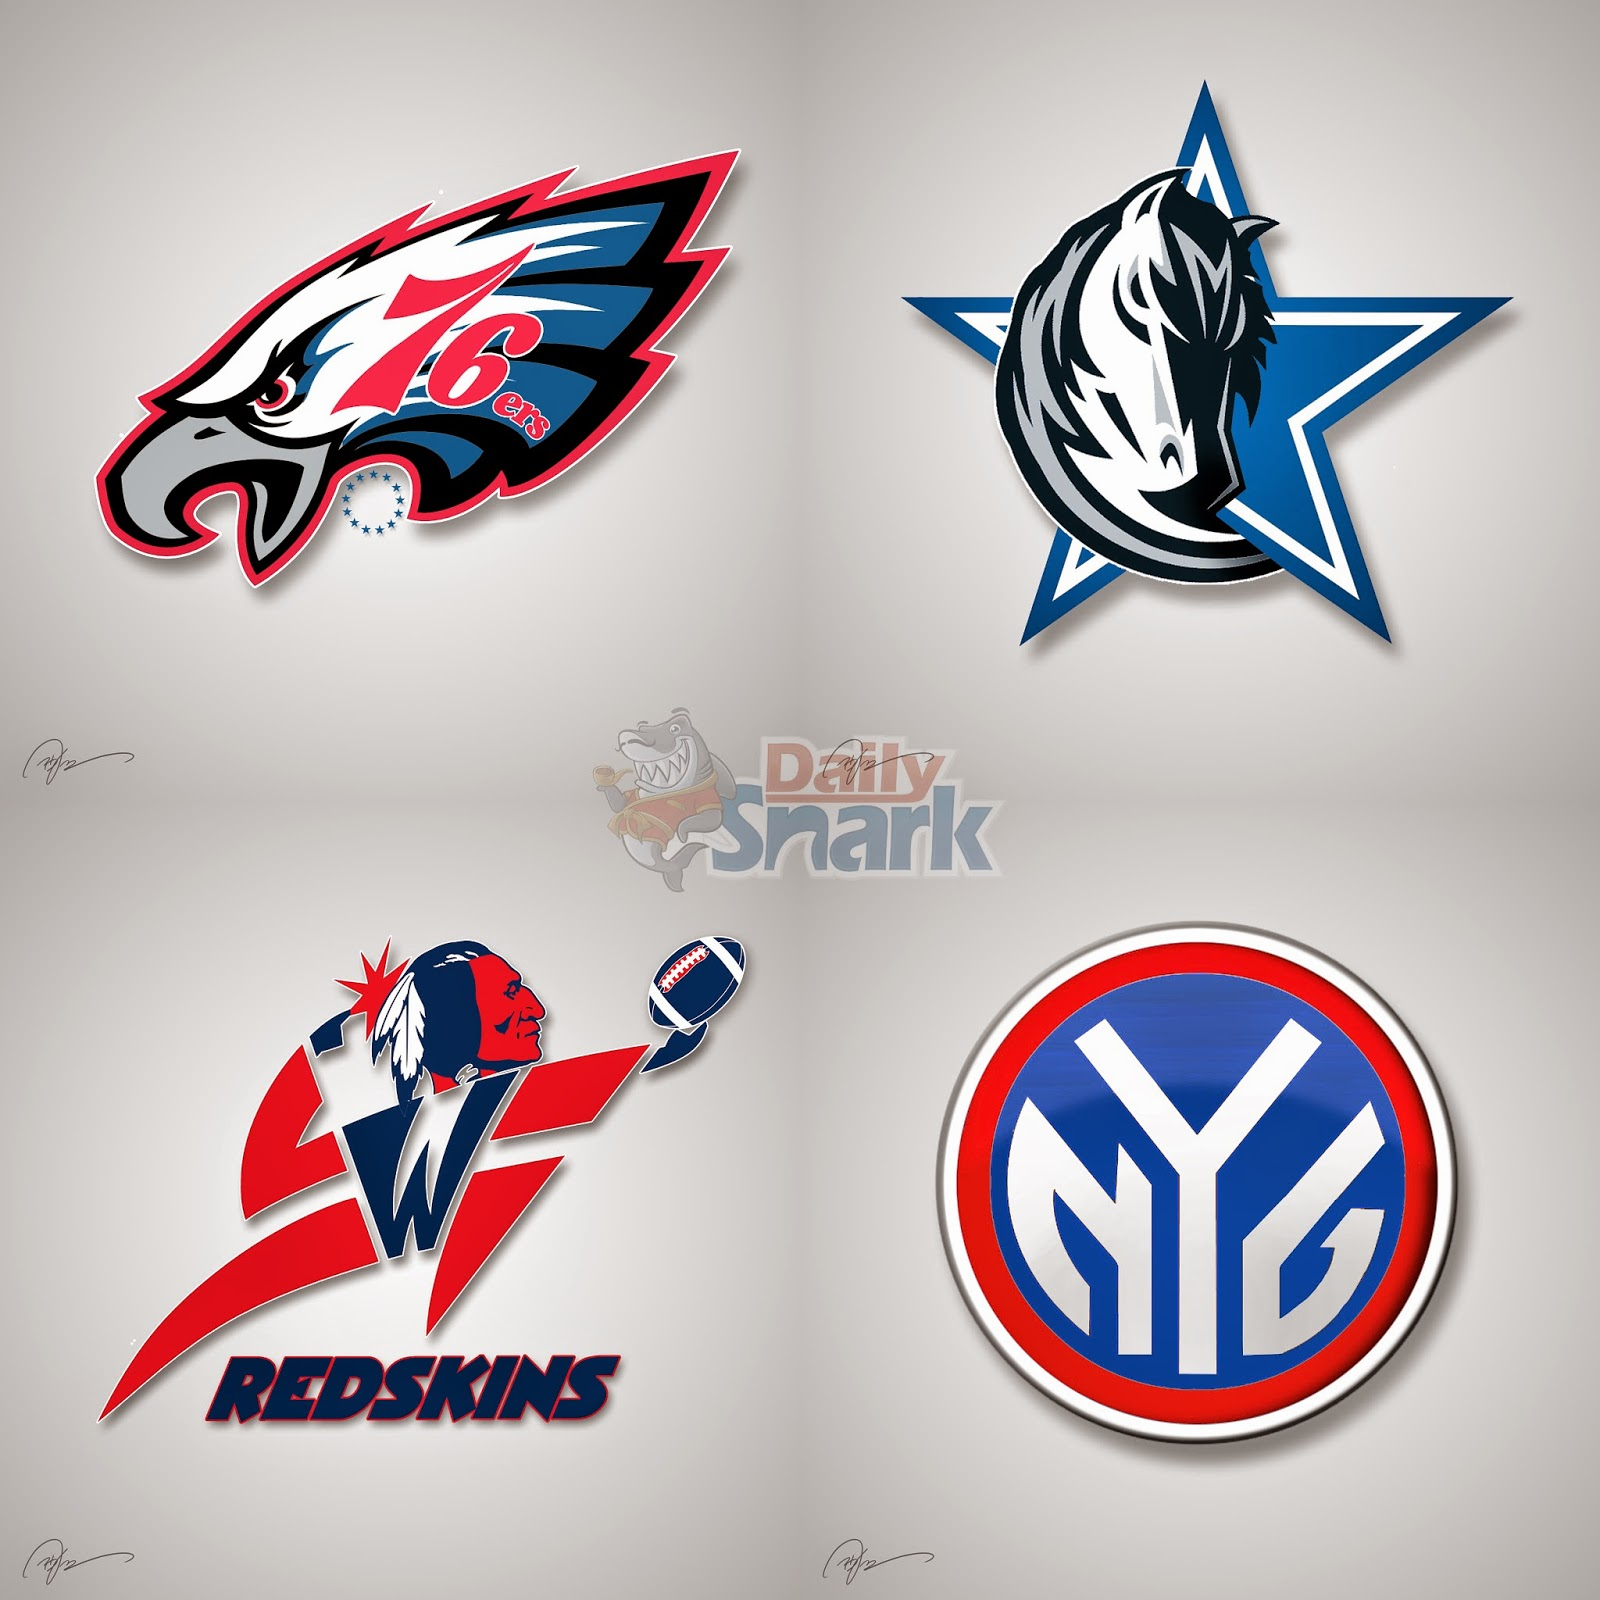 Nuggets Vs Rockets 2014: Check Out This Hybrid Boston Celtics-New England Patriots